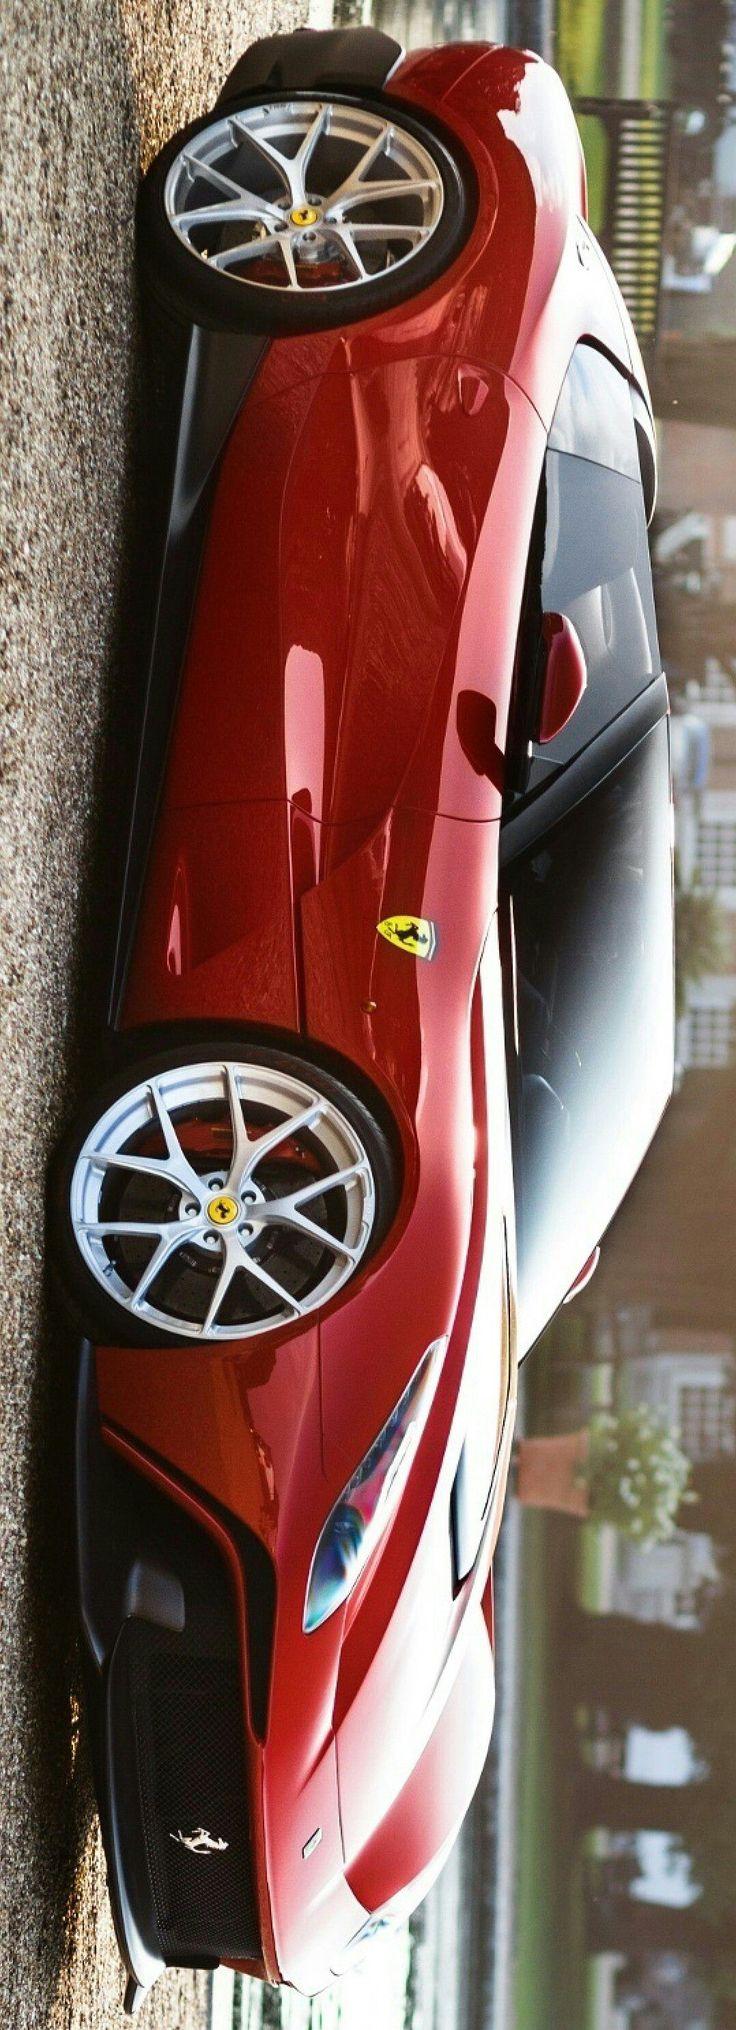 Ferrari F12 TRS $4,500,000 by Levon